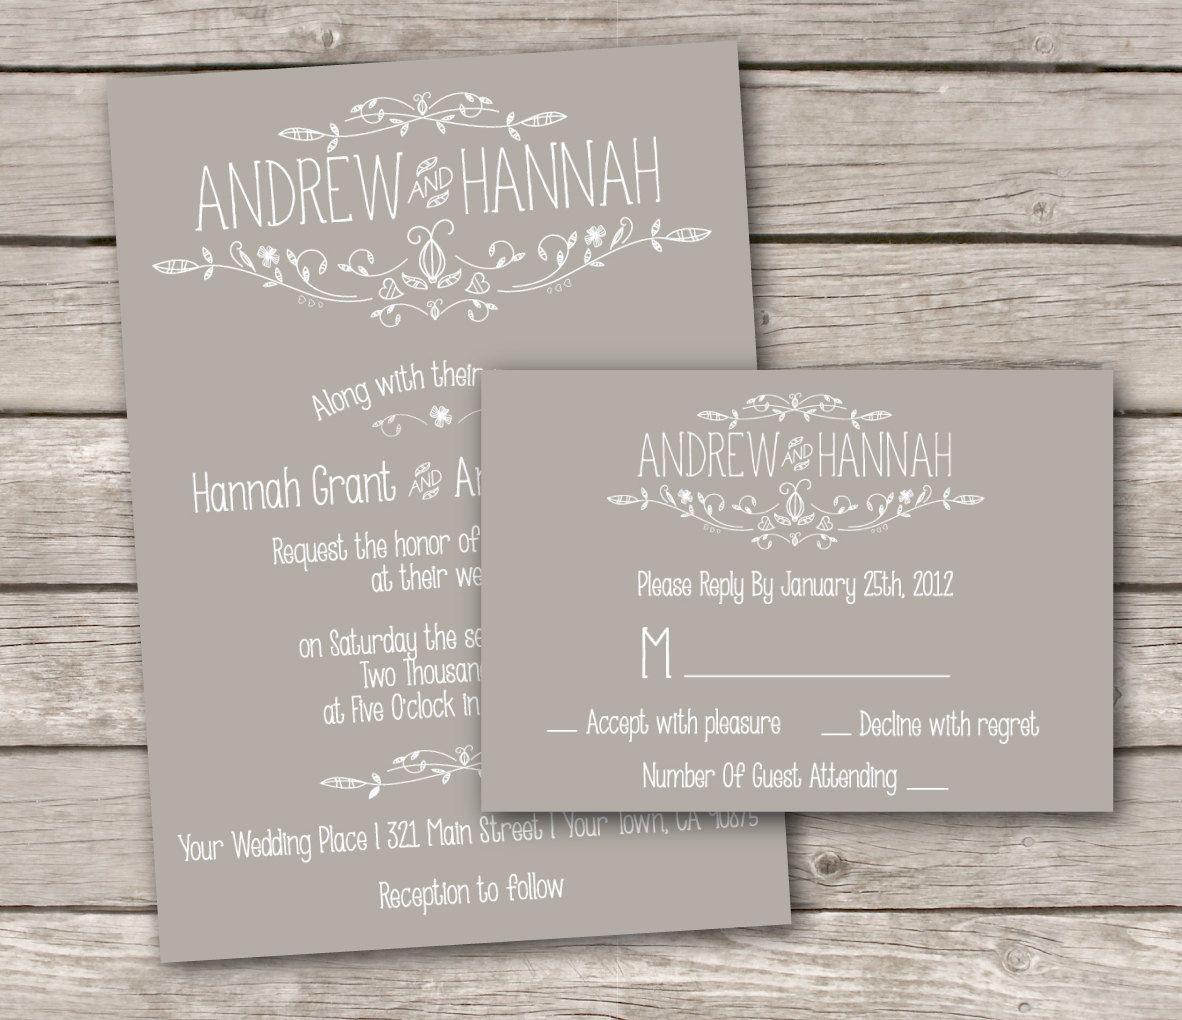 Cheap Printed Wedding Invitations: Vintage Wedding Invitation And RSVP -Printable DIY